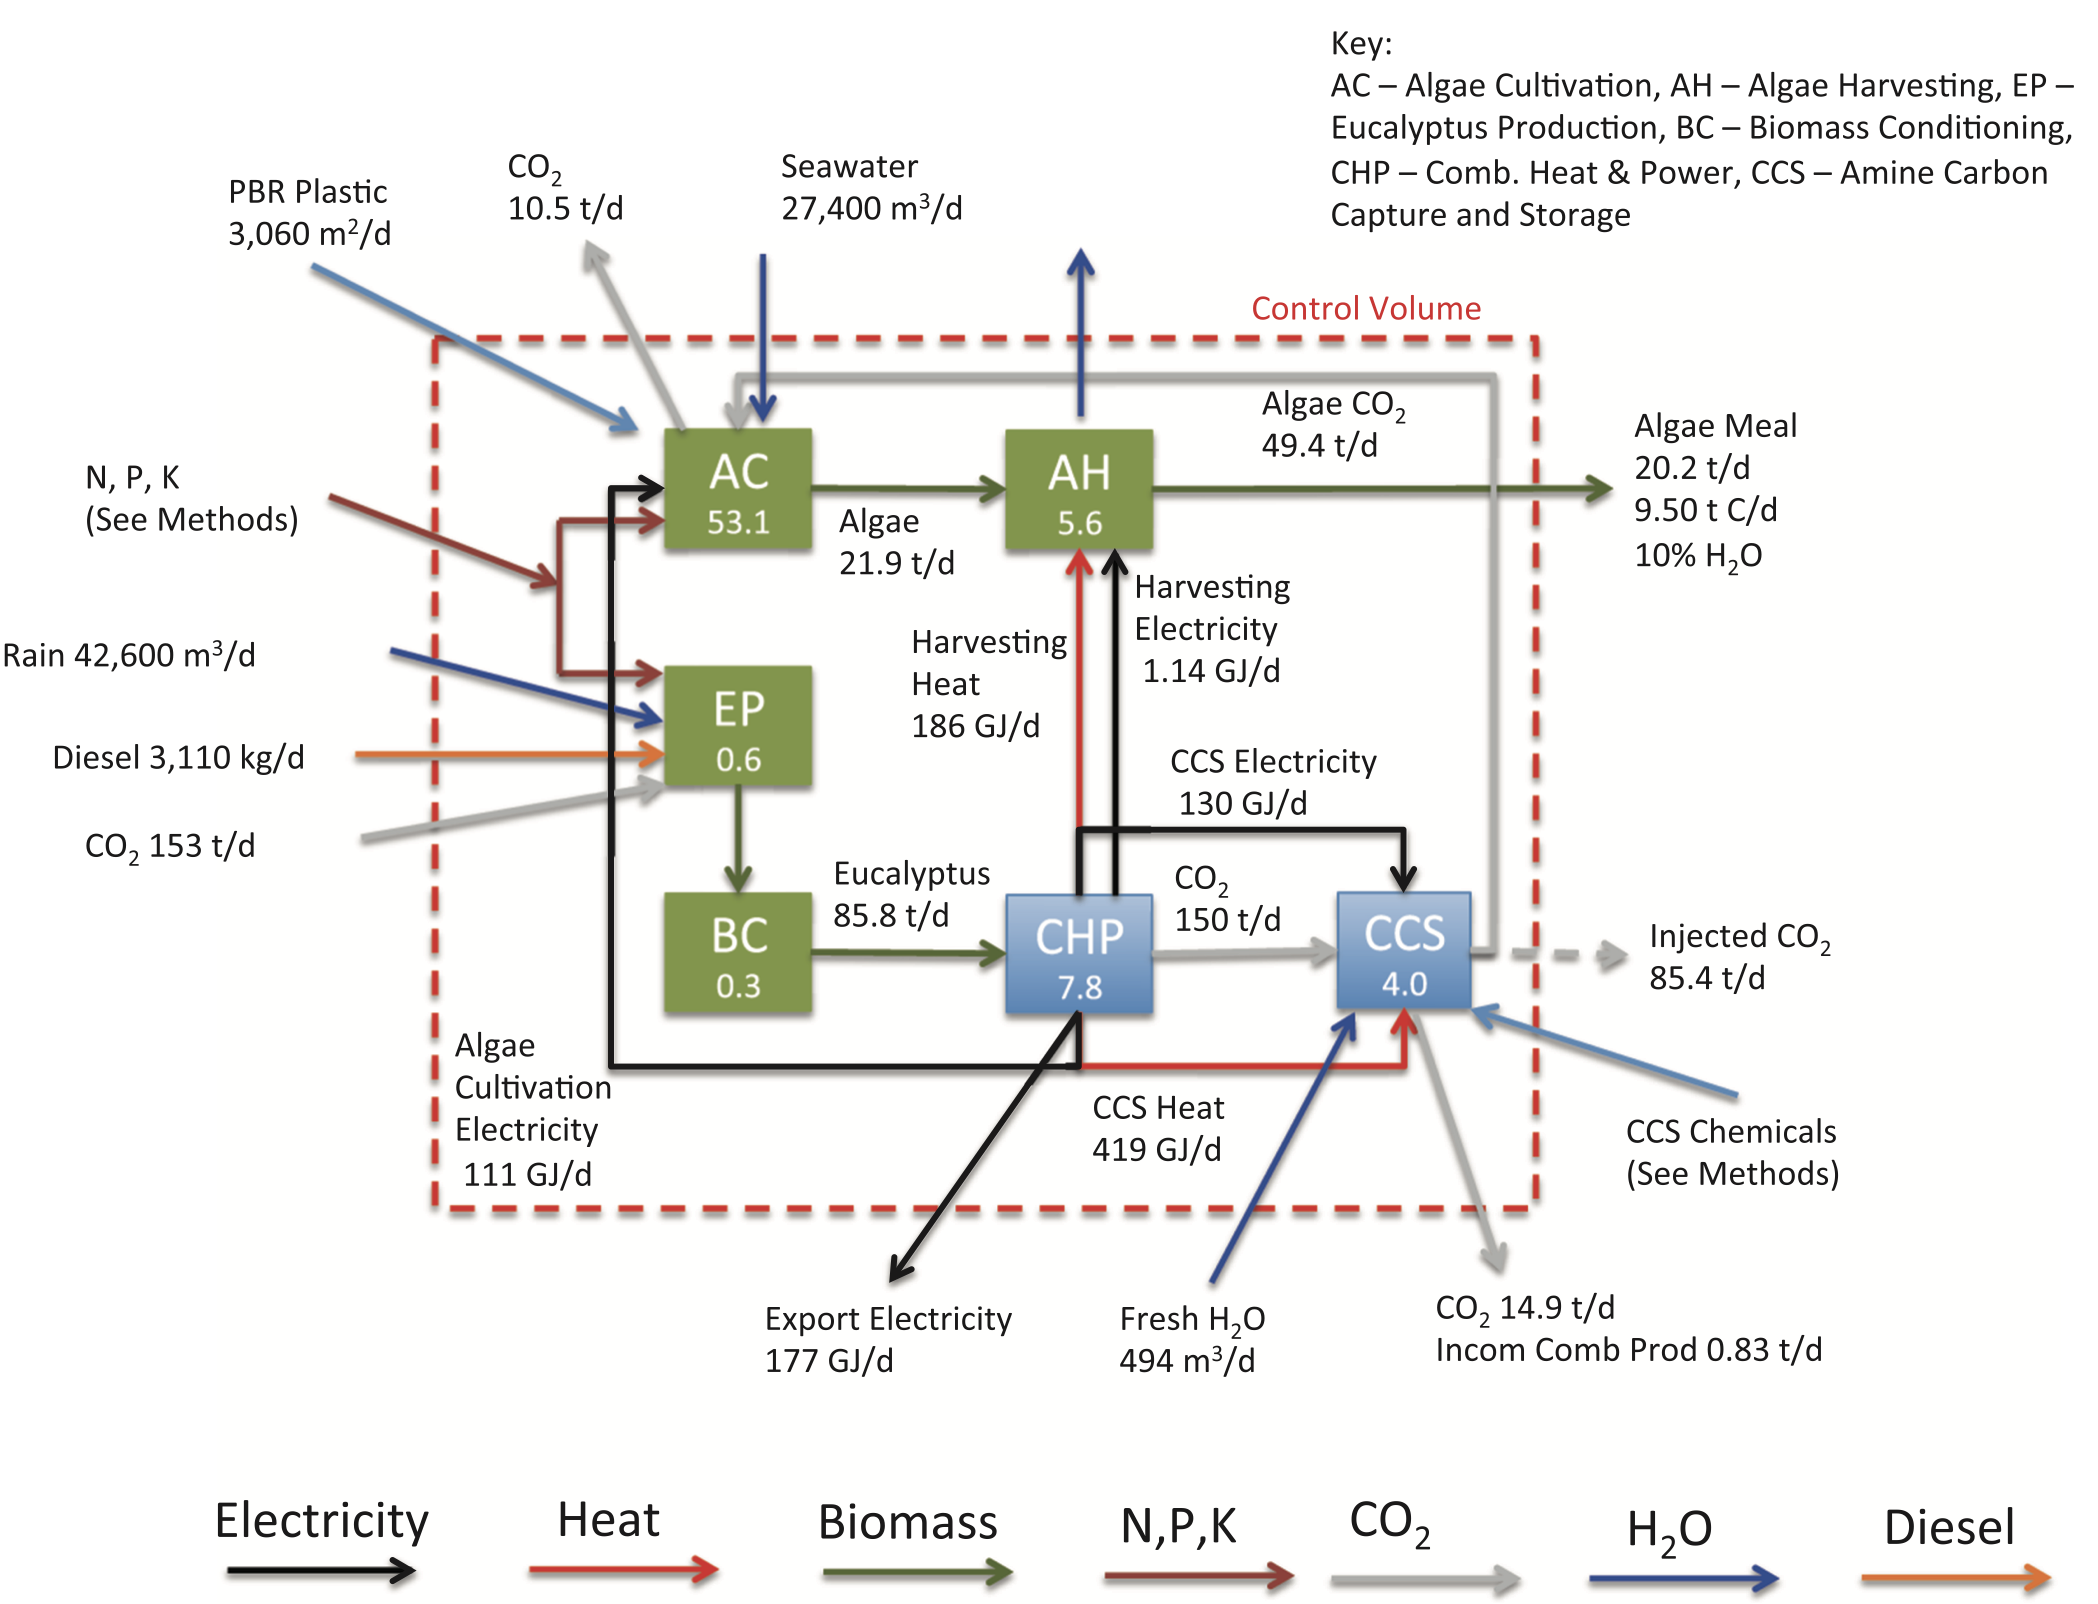 Phd thesis on algae production for bioenergy